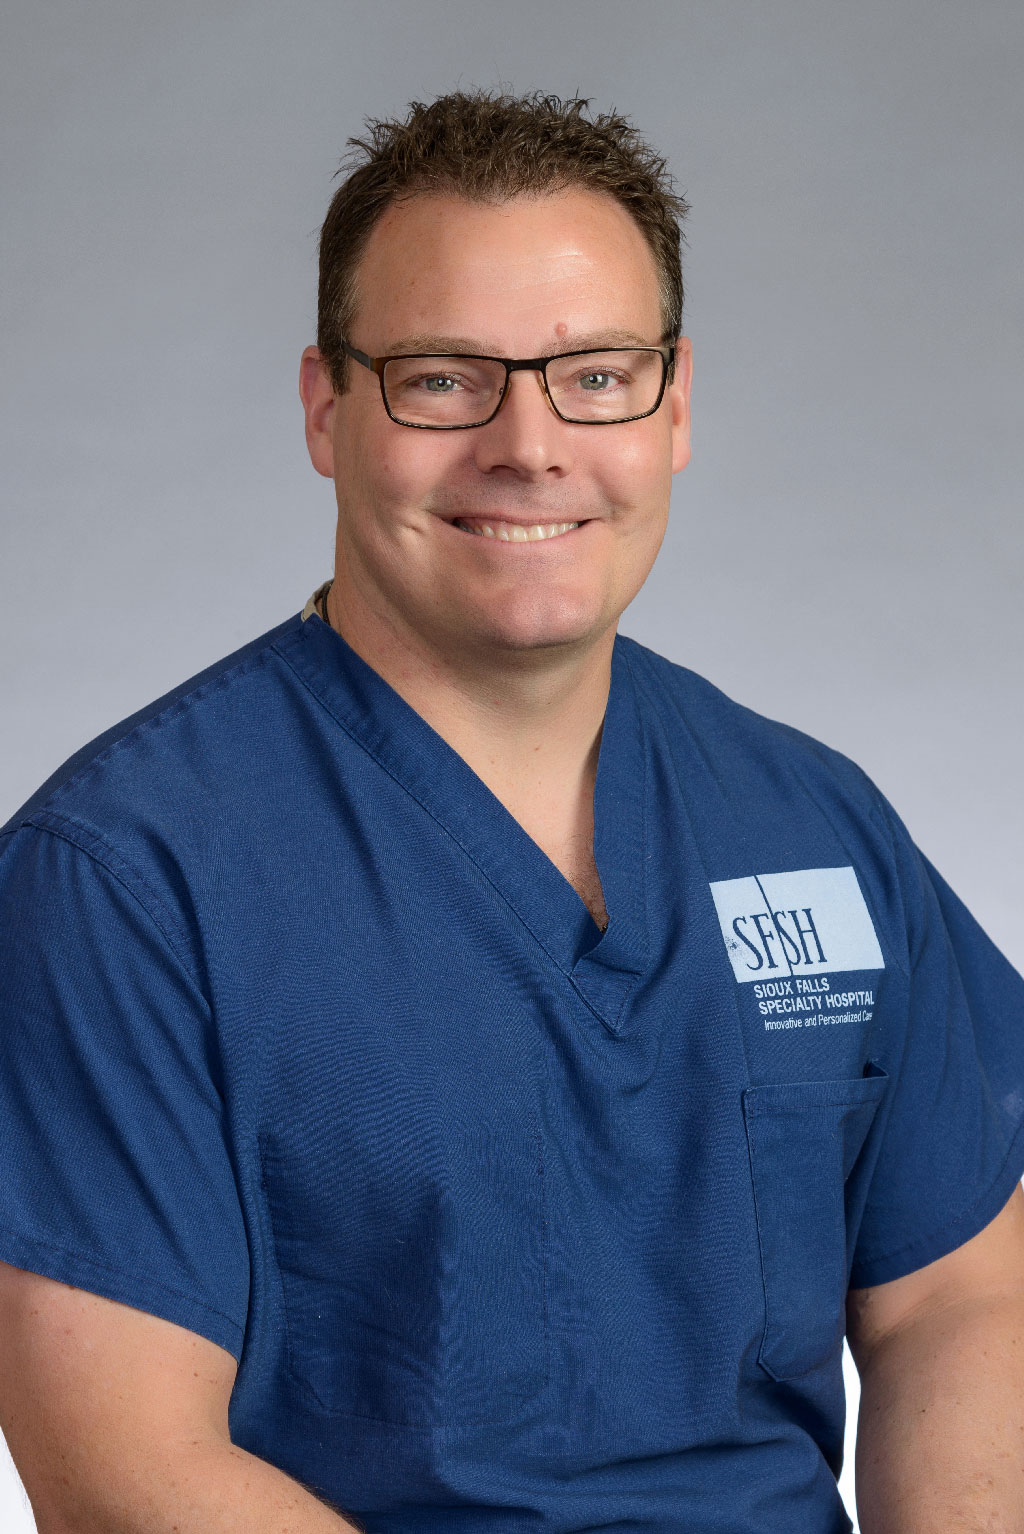 Eric S. Watson, MD